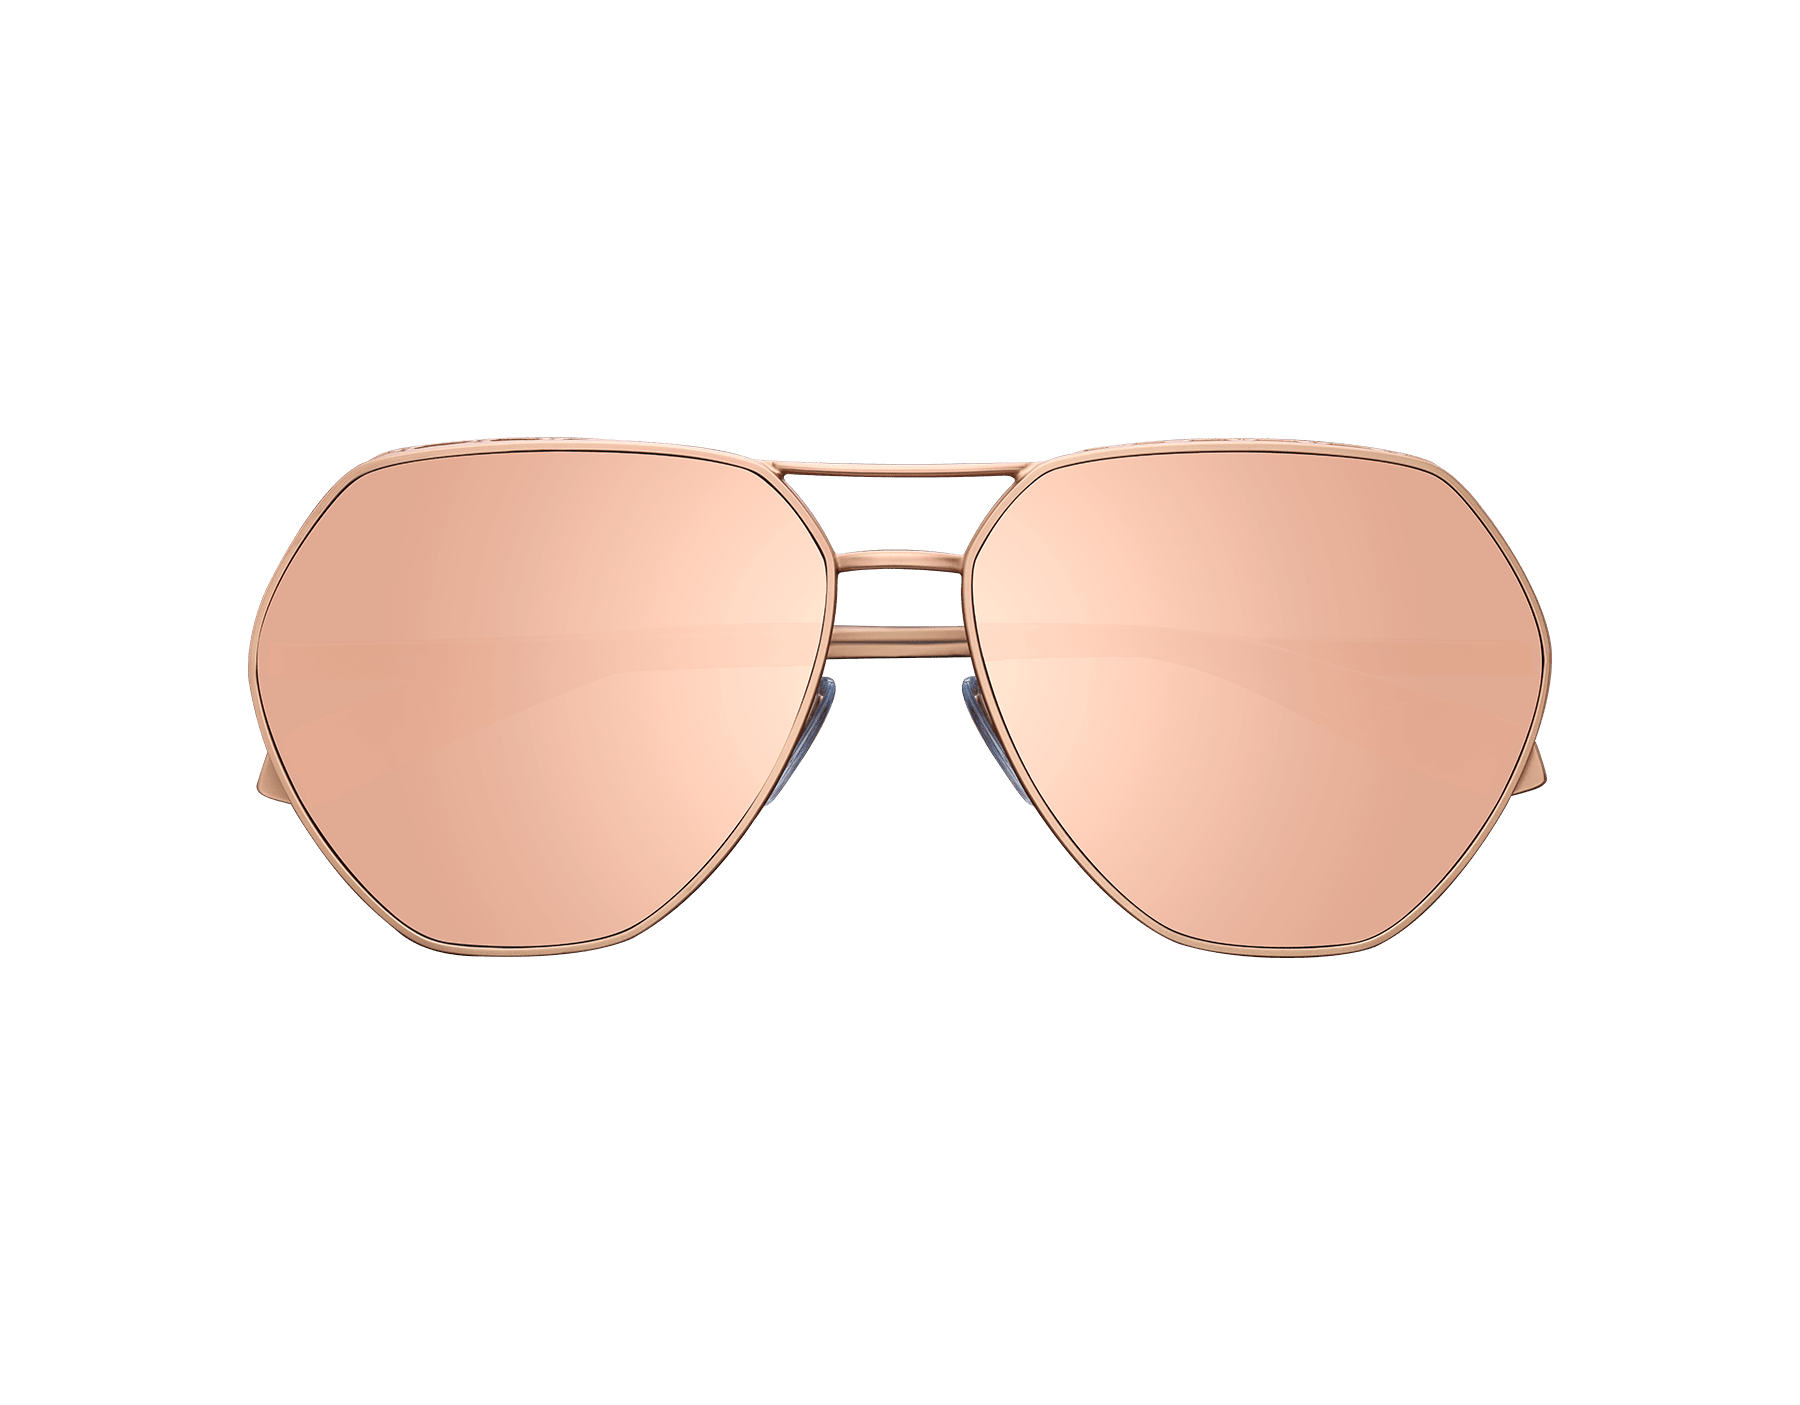 Serpenti 'Freedomation' oversized aviator sunglasses with flat, angular lenses. 903404 image 1